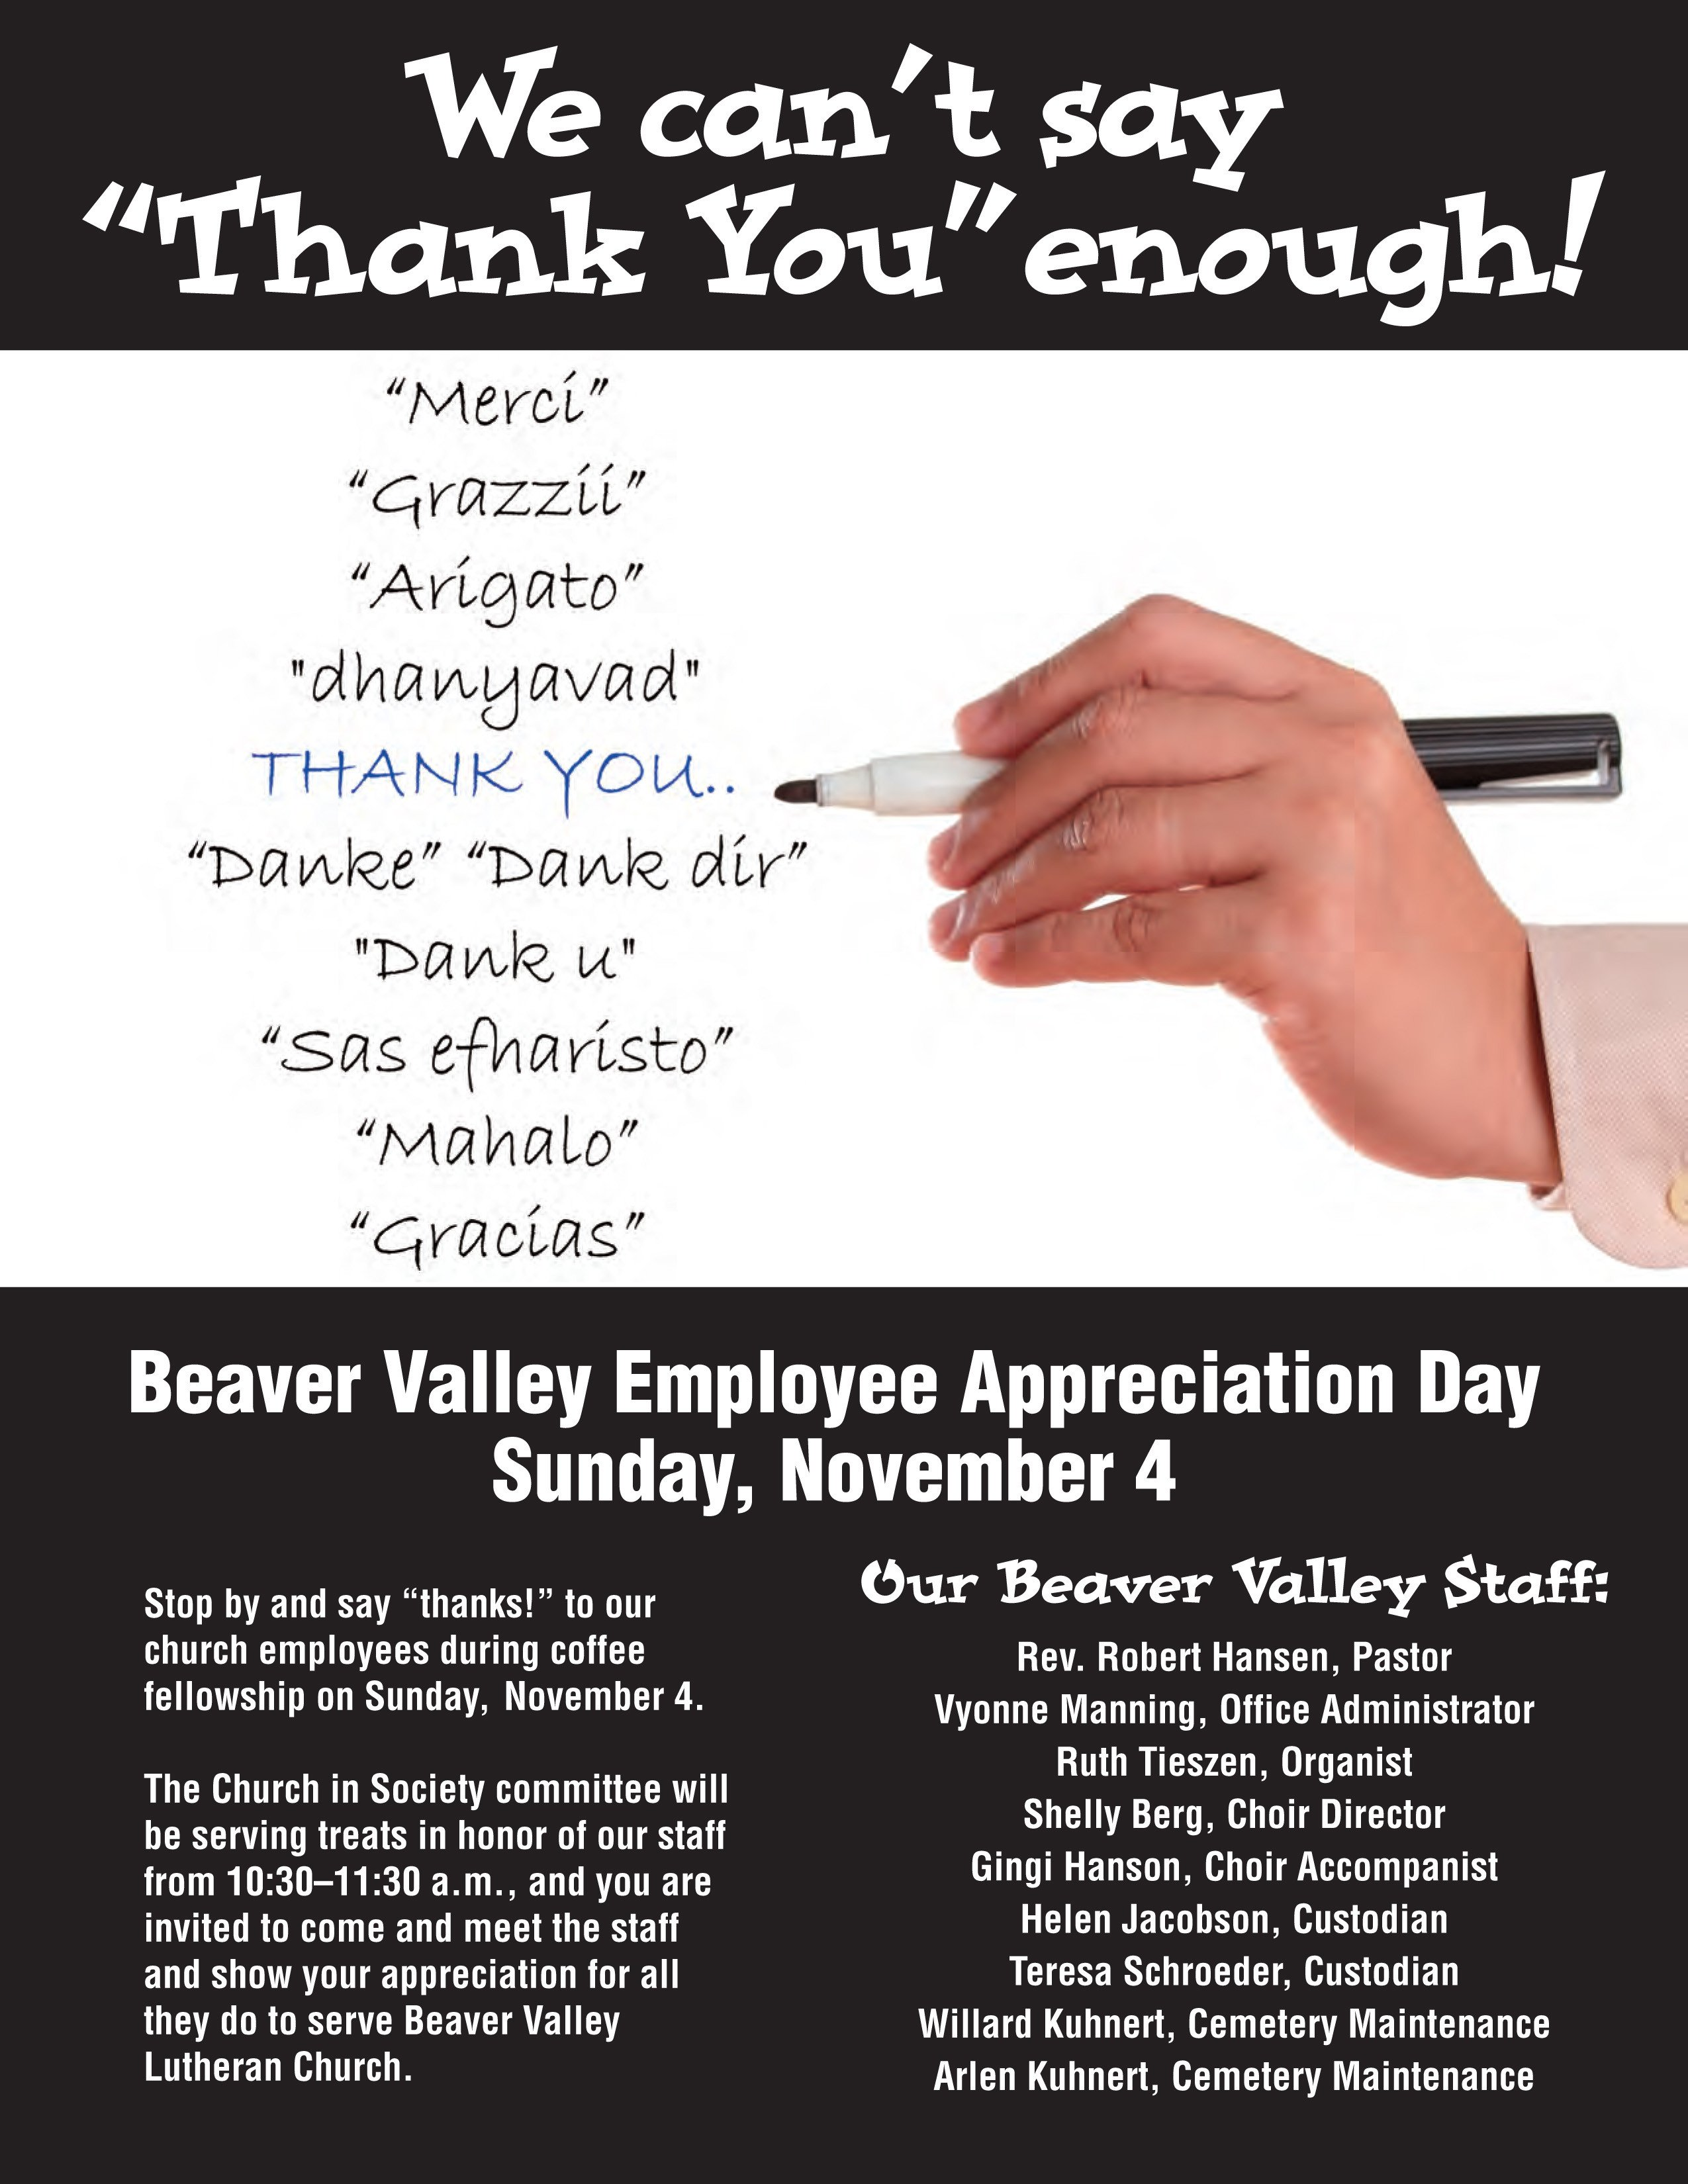 Employee Appreciation Day Flyer Template Staff Appreciation Day Nov 4